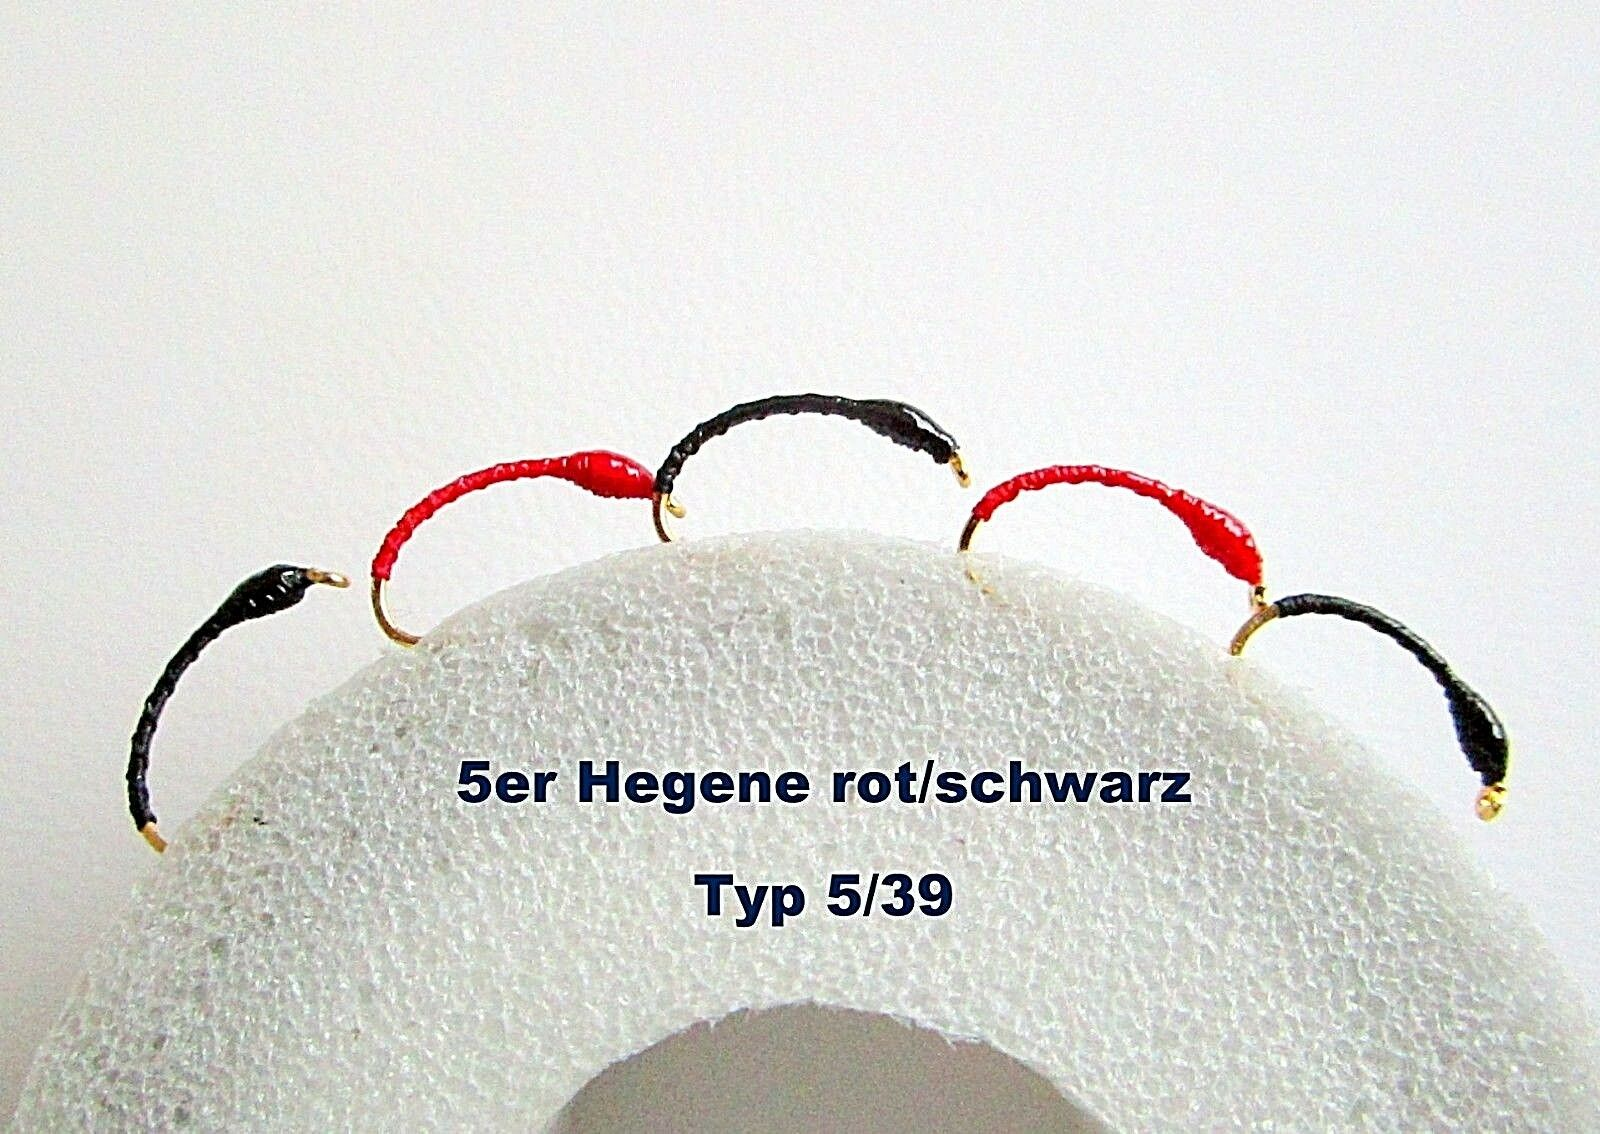 5er Büschelkopf  Nymphen Hegene  Renken Barsch Forellen Felchen Saibling Gambe